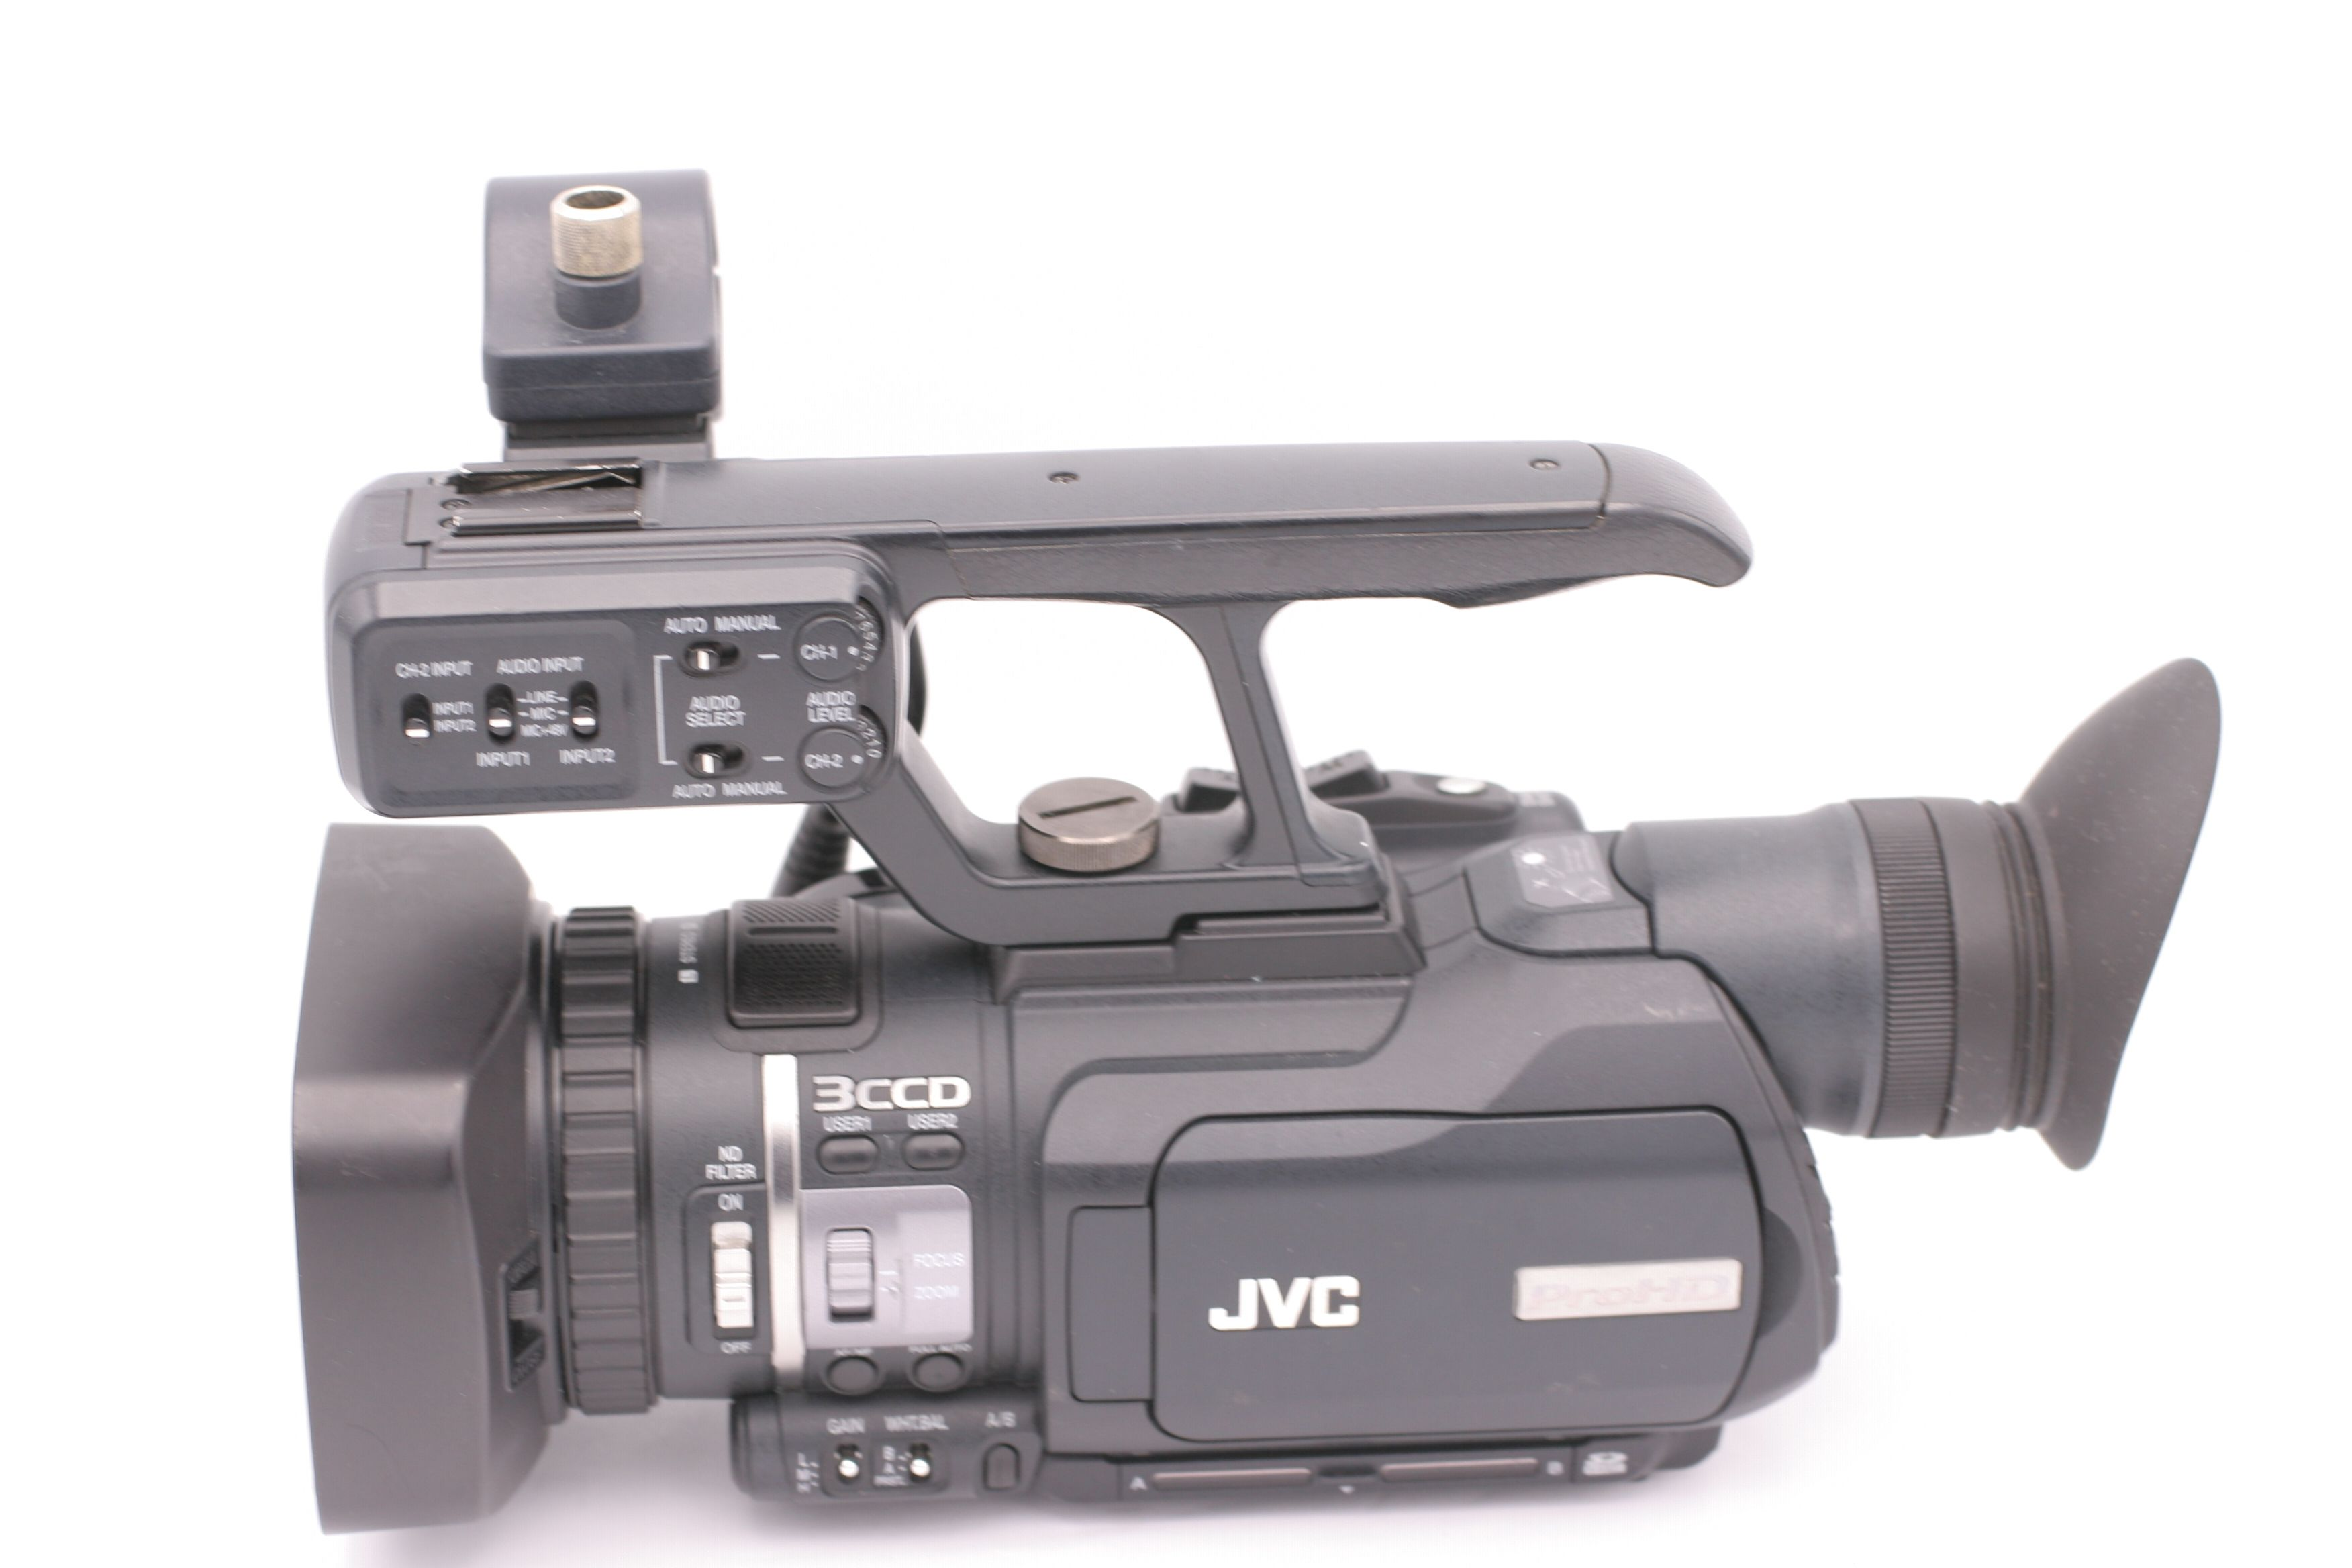 jvc gy hm100u hd 3ccd professional video camcorder 46838039522 ebay rh ebay com JVC GY HM100U Manual jvc gy-hm100u manual